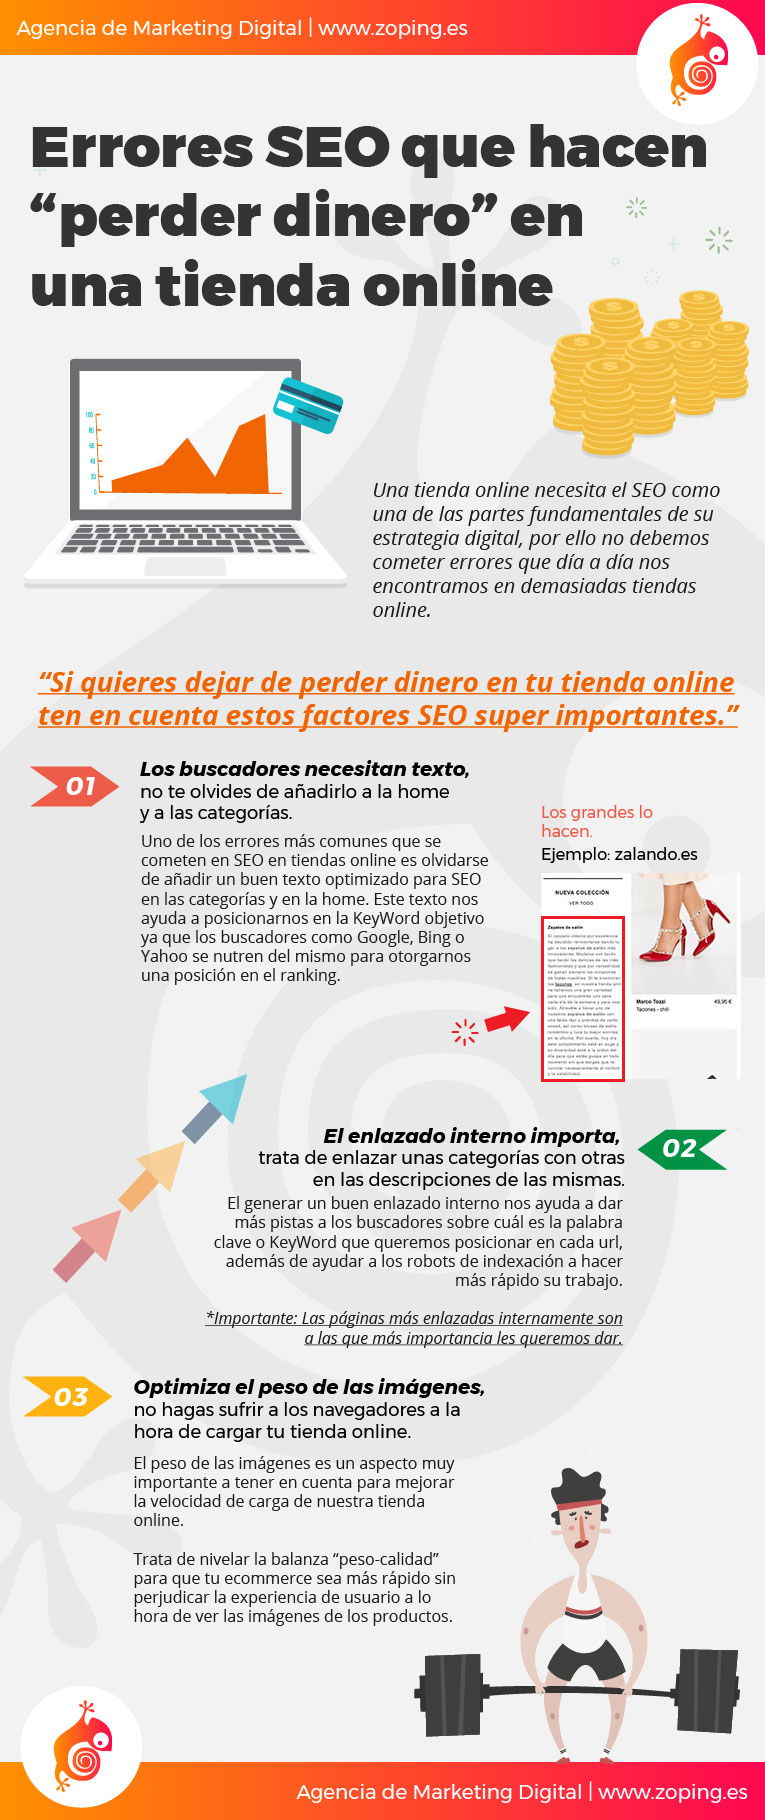 Errores SEO en una Tienda Online #infografia #infographic #ecommerce #seo